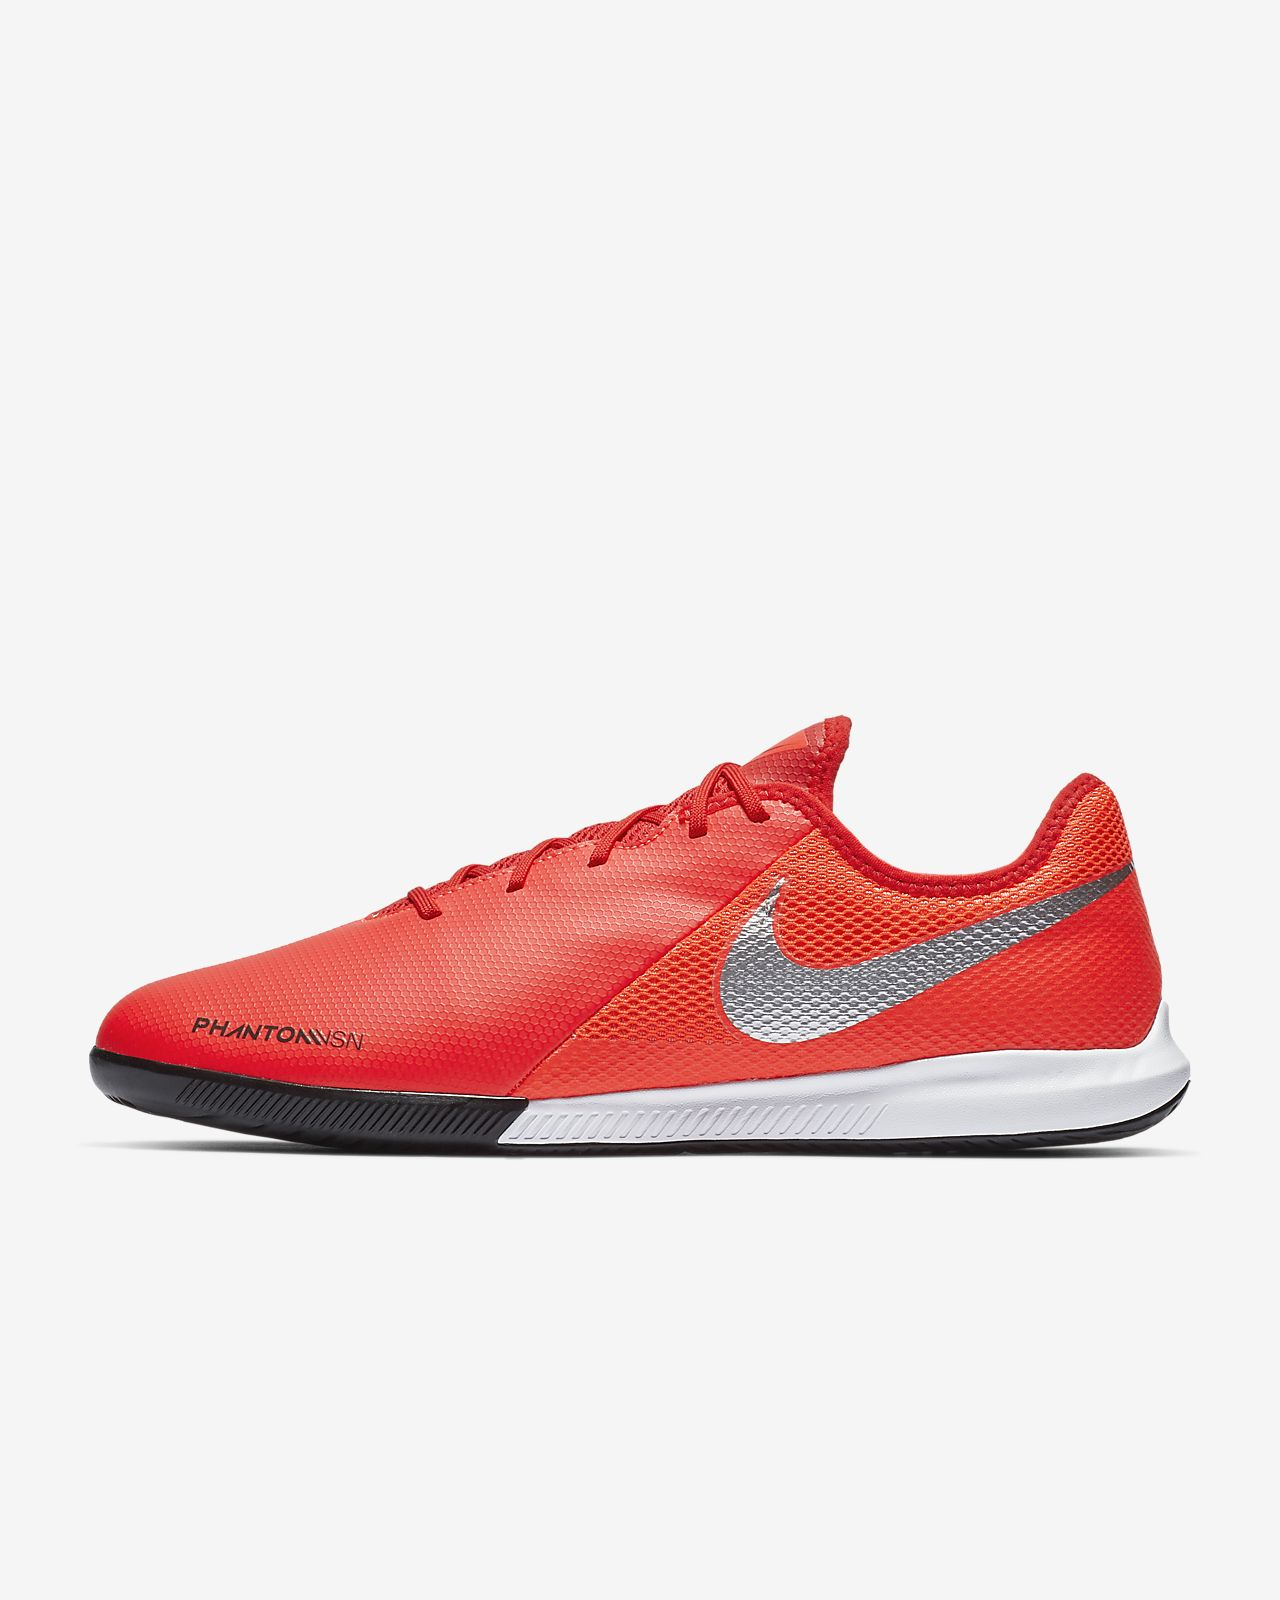 newest e0490 cd596 ... Calzado de fútbol para cancha cubierta Nike PhantomVSN Academy Game  Over IC